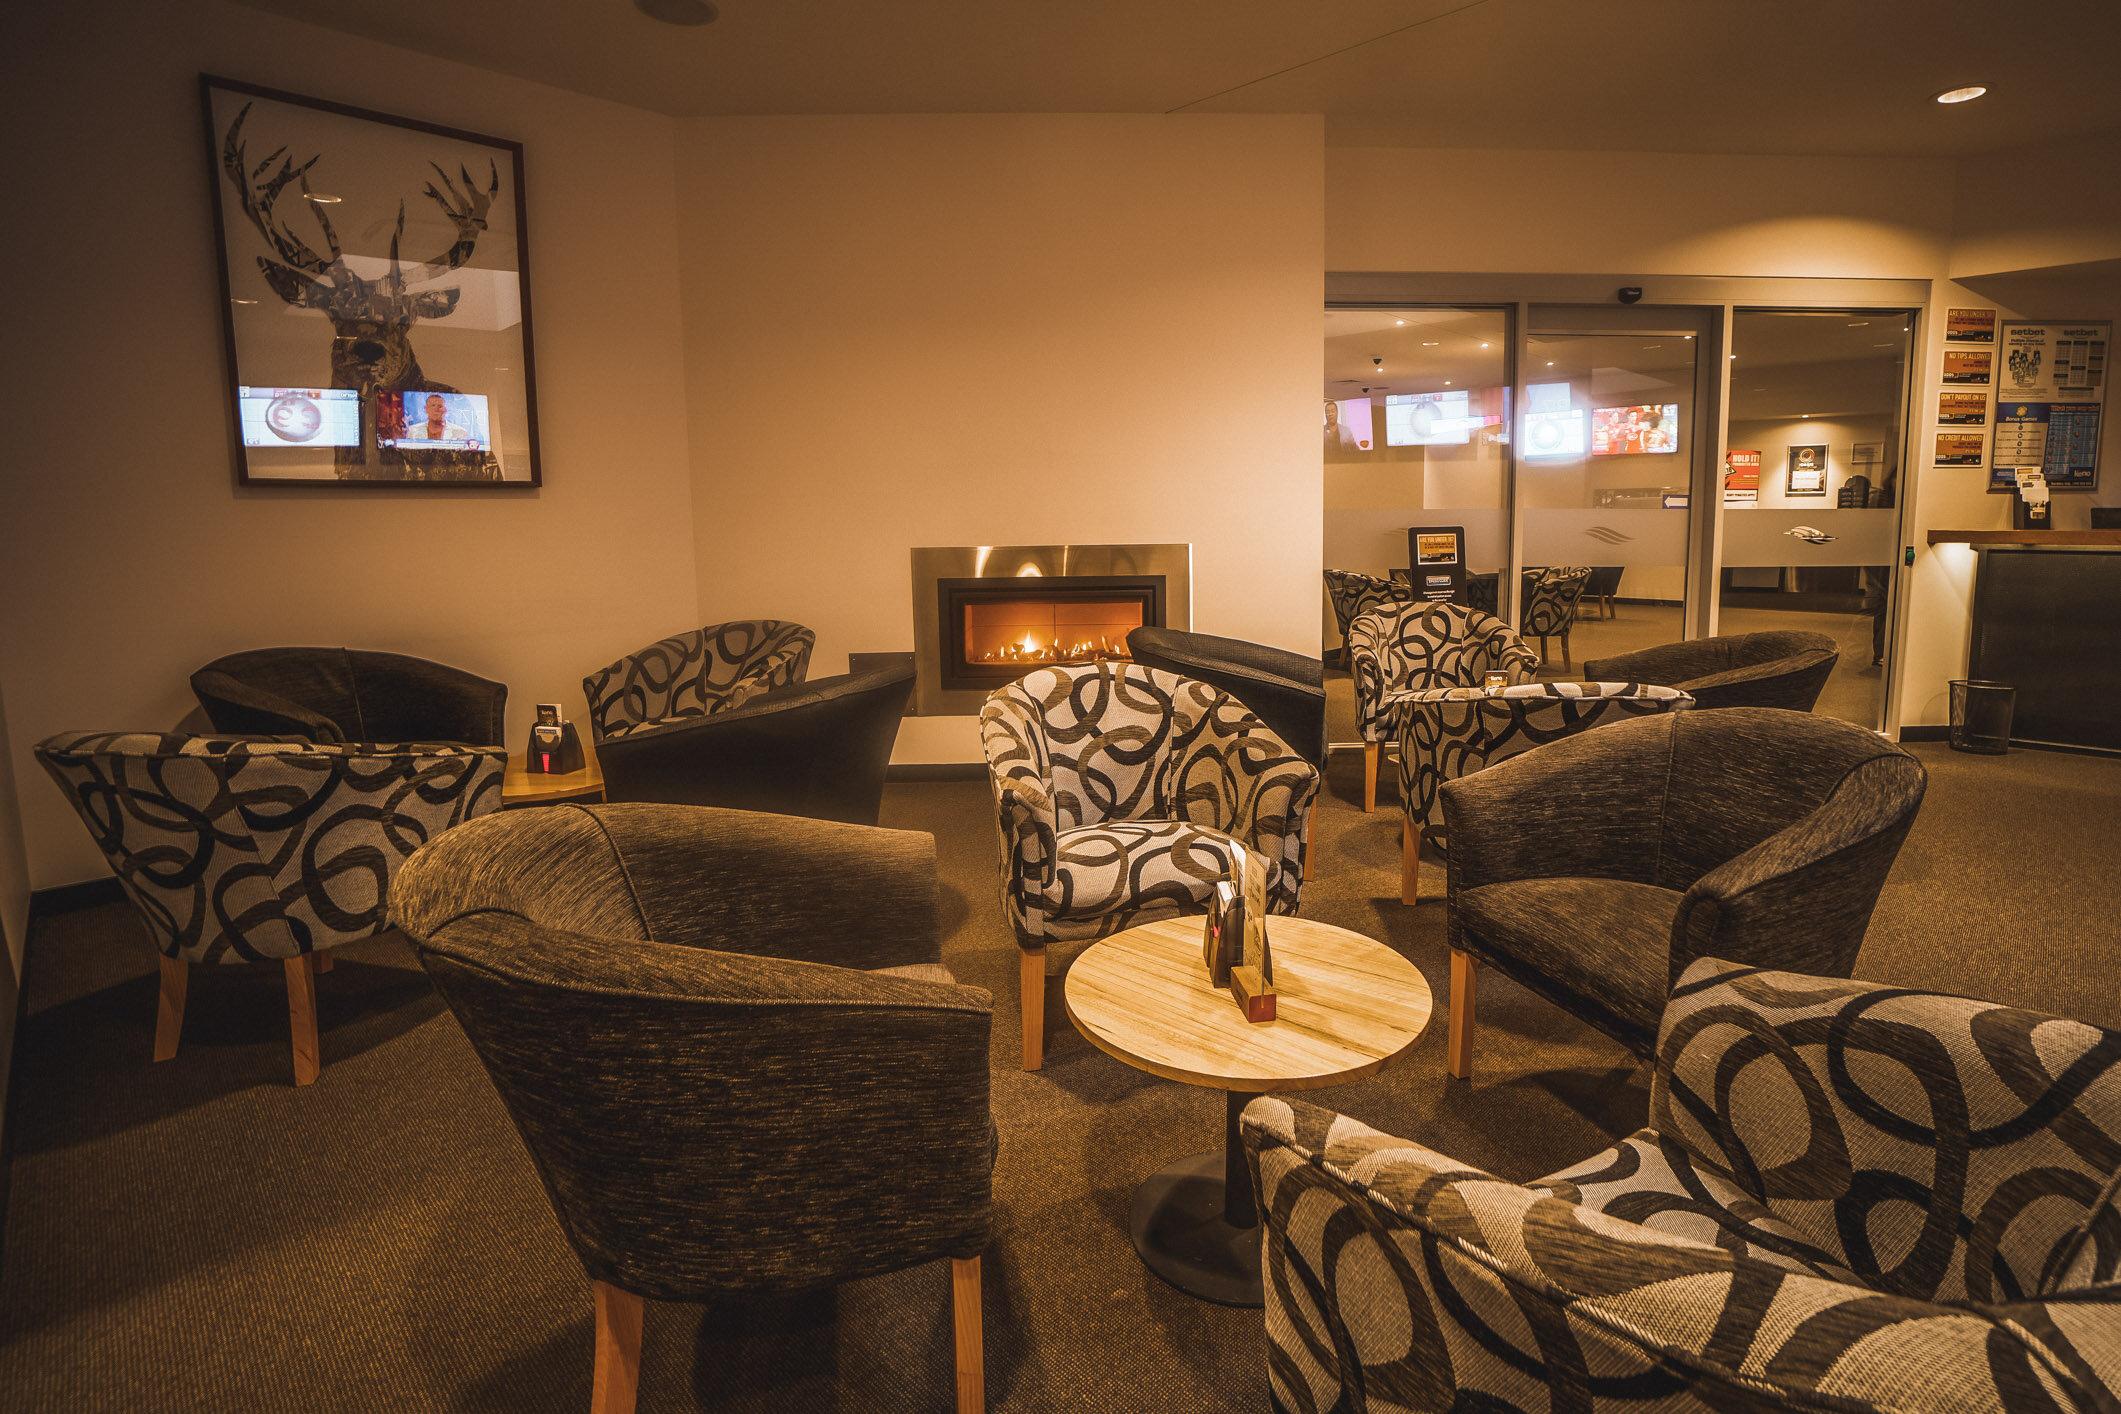 Risdon Brook Hotel (Web) (9 of 24).jpg